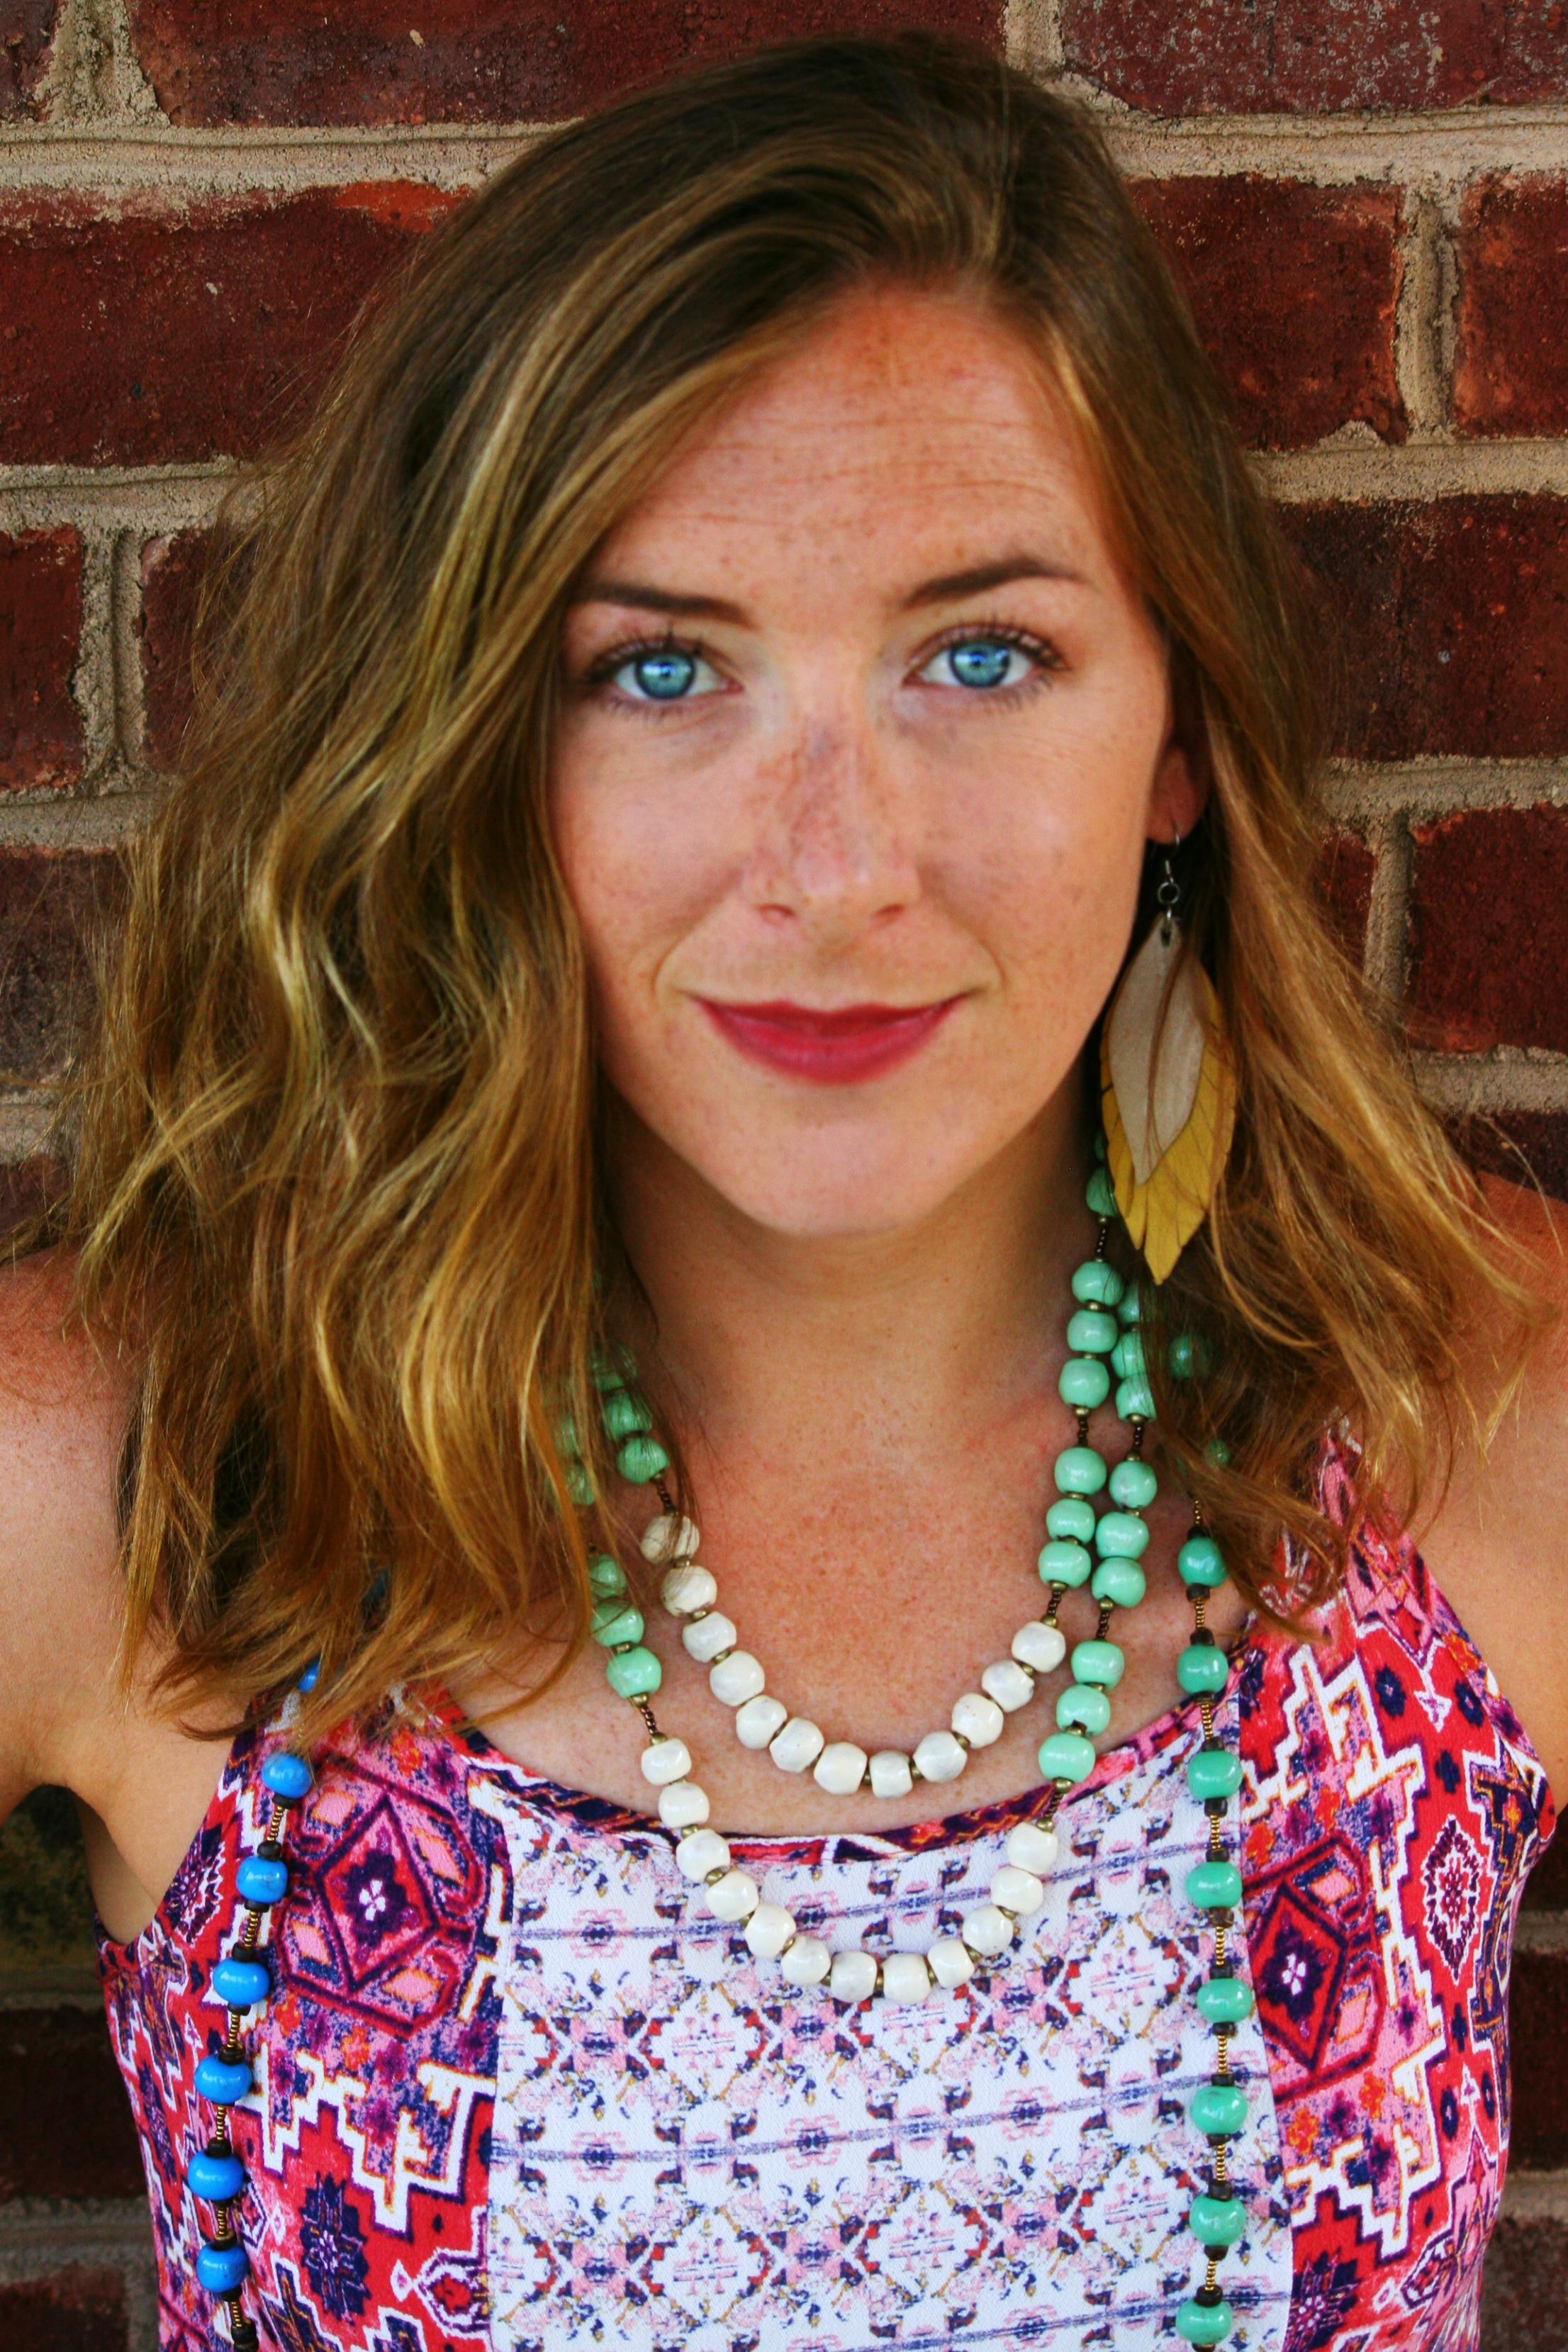 - Photography and styling by: Jennifer EliasonMake up and assistance: Avery Eliason